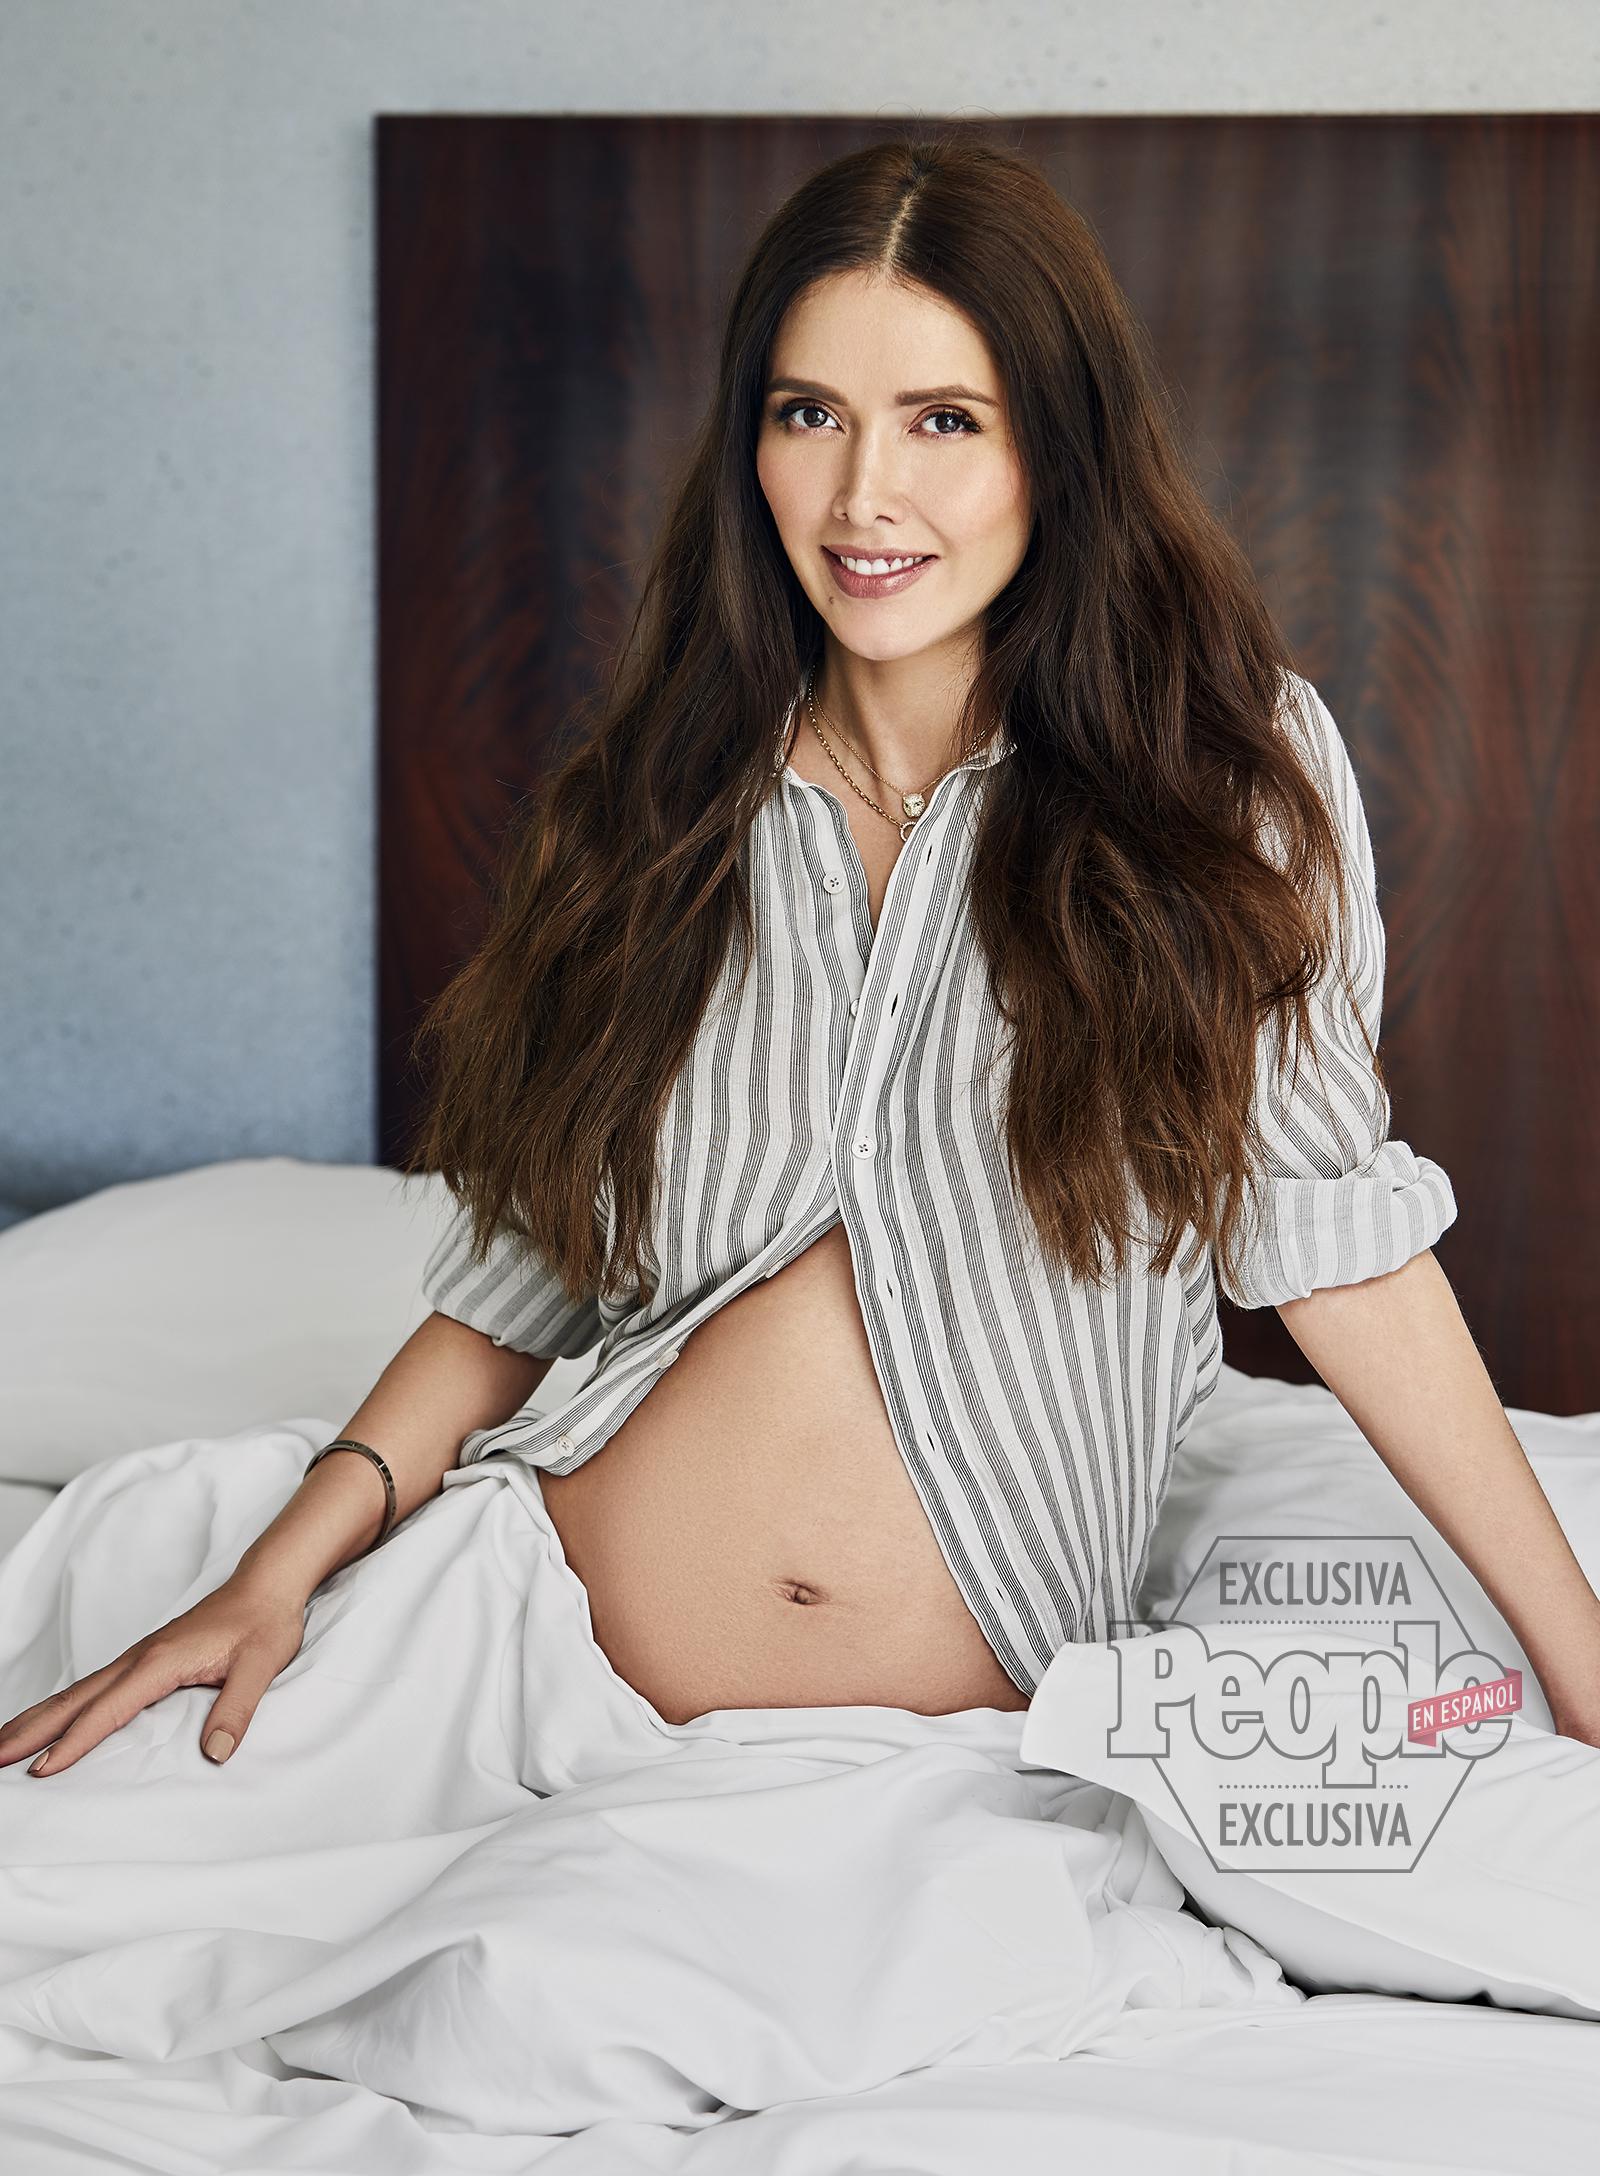 Marlene Favela consejos embarazo | People en Español